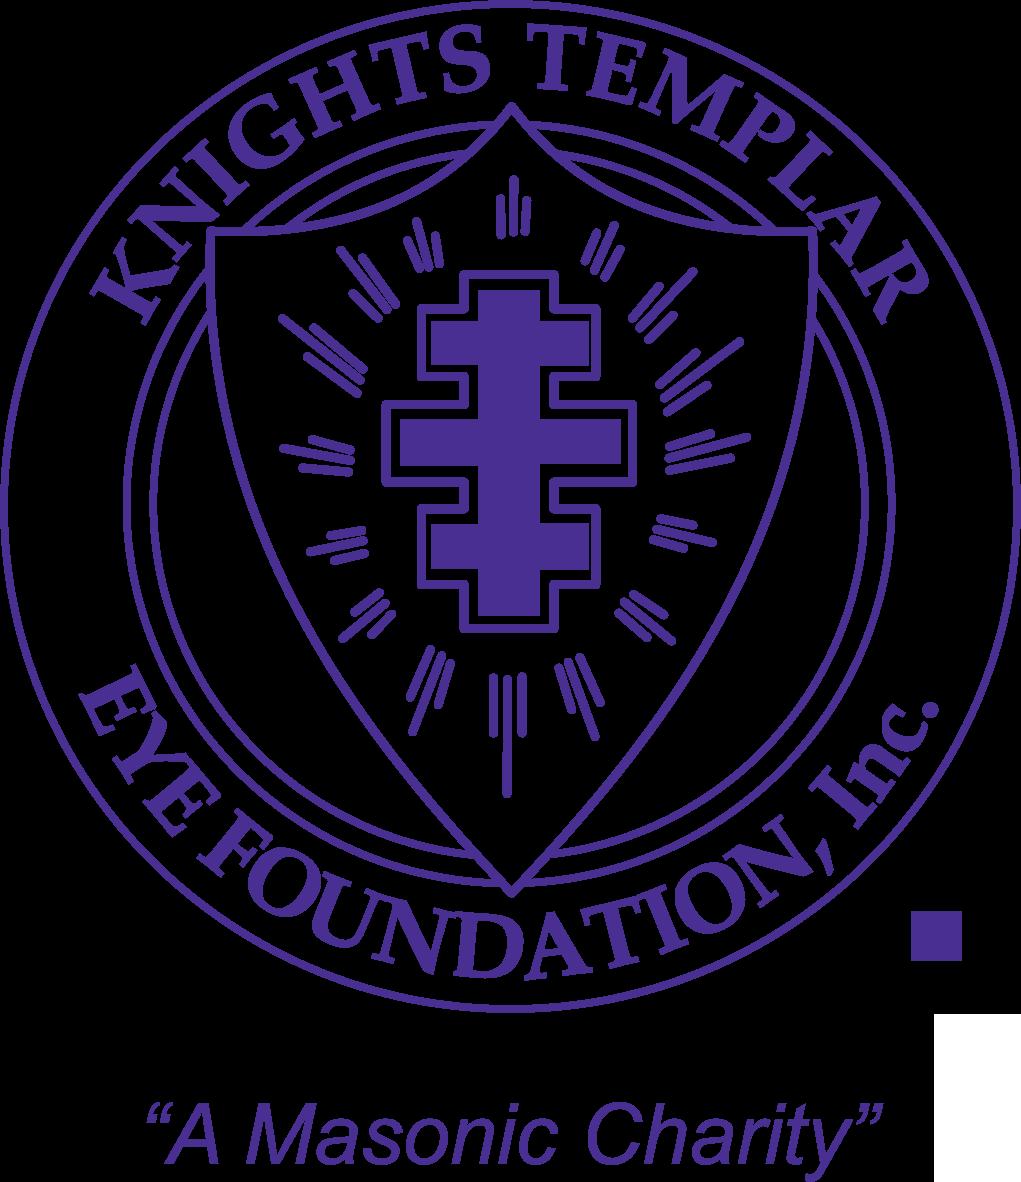 Knights Templar Eye Foundation